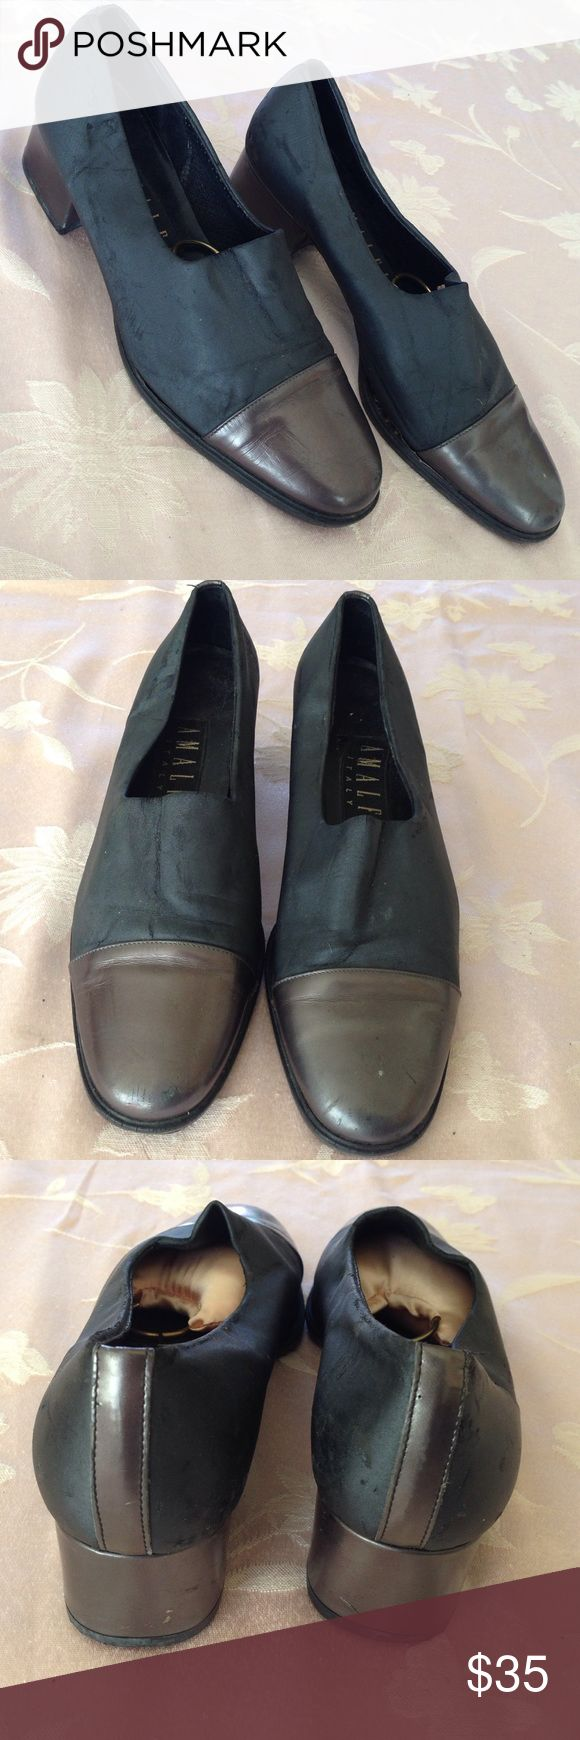 Amalfi Italian Apillow slip on shoes Size 6B heeled slip on shoes. Genuine leather. Some wear and tear. Amalfi Shoes Flats & Loafers